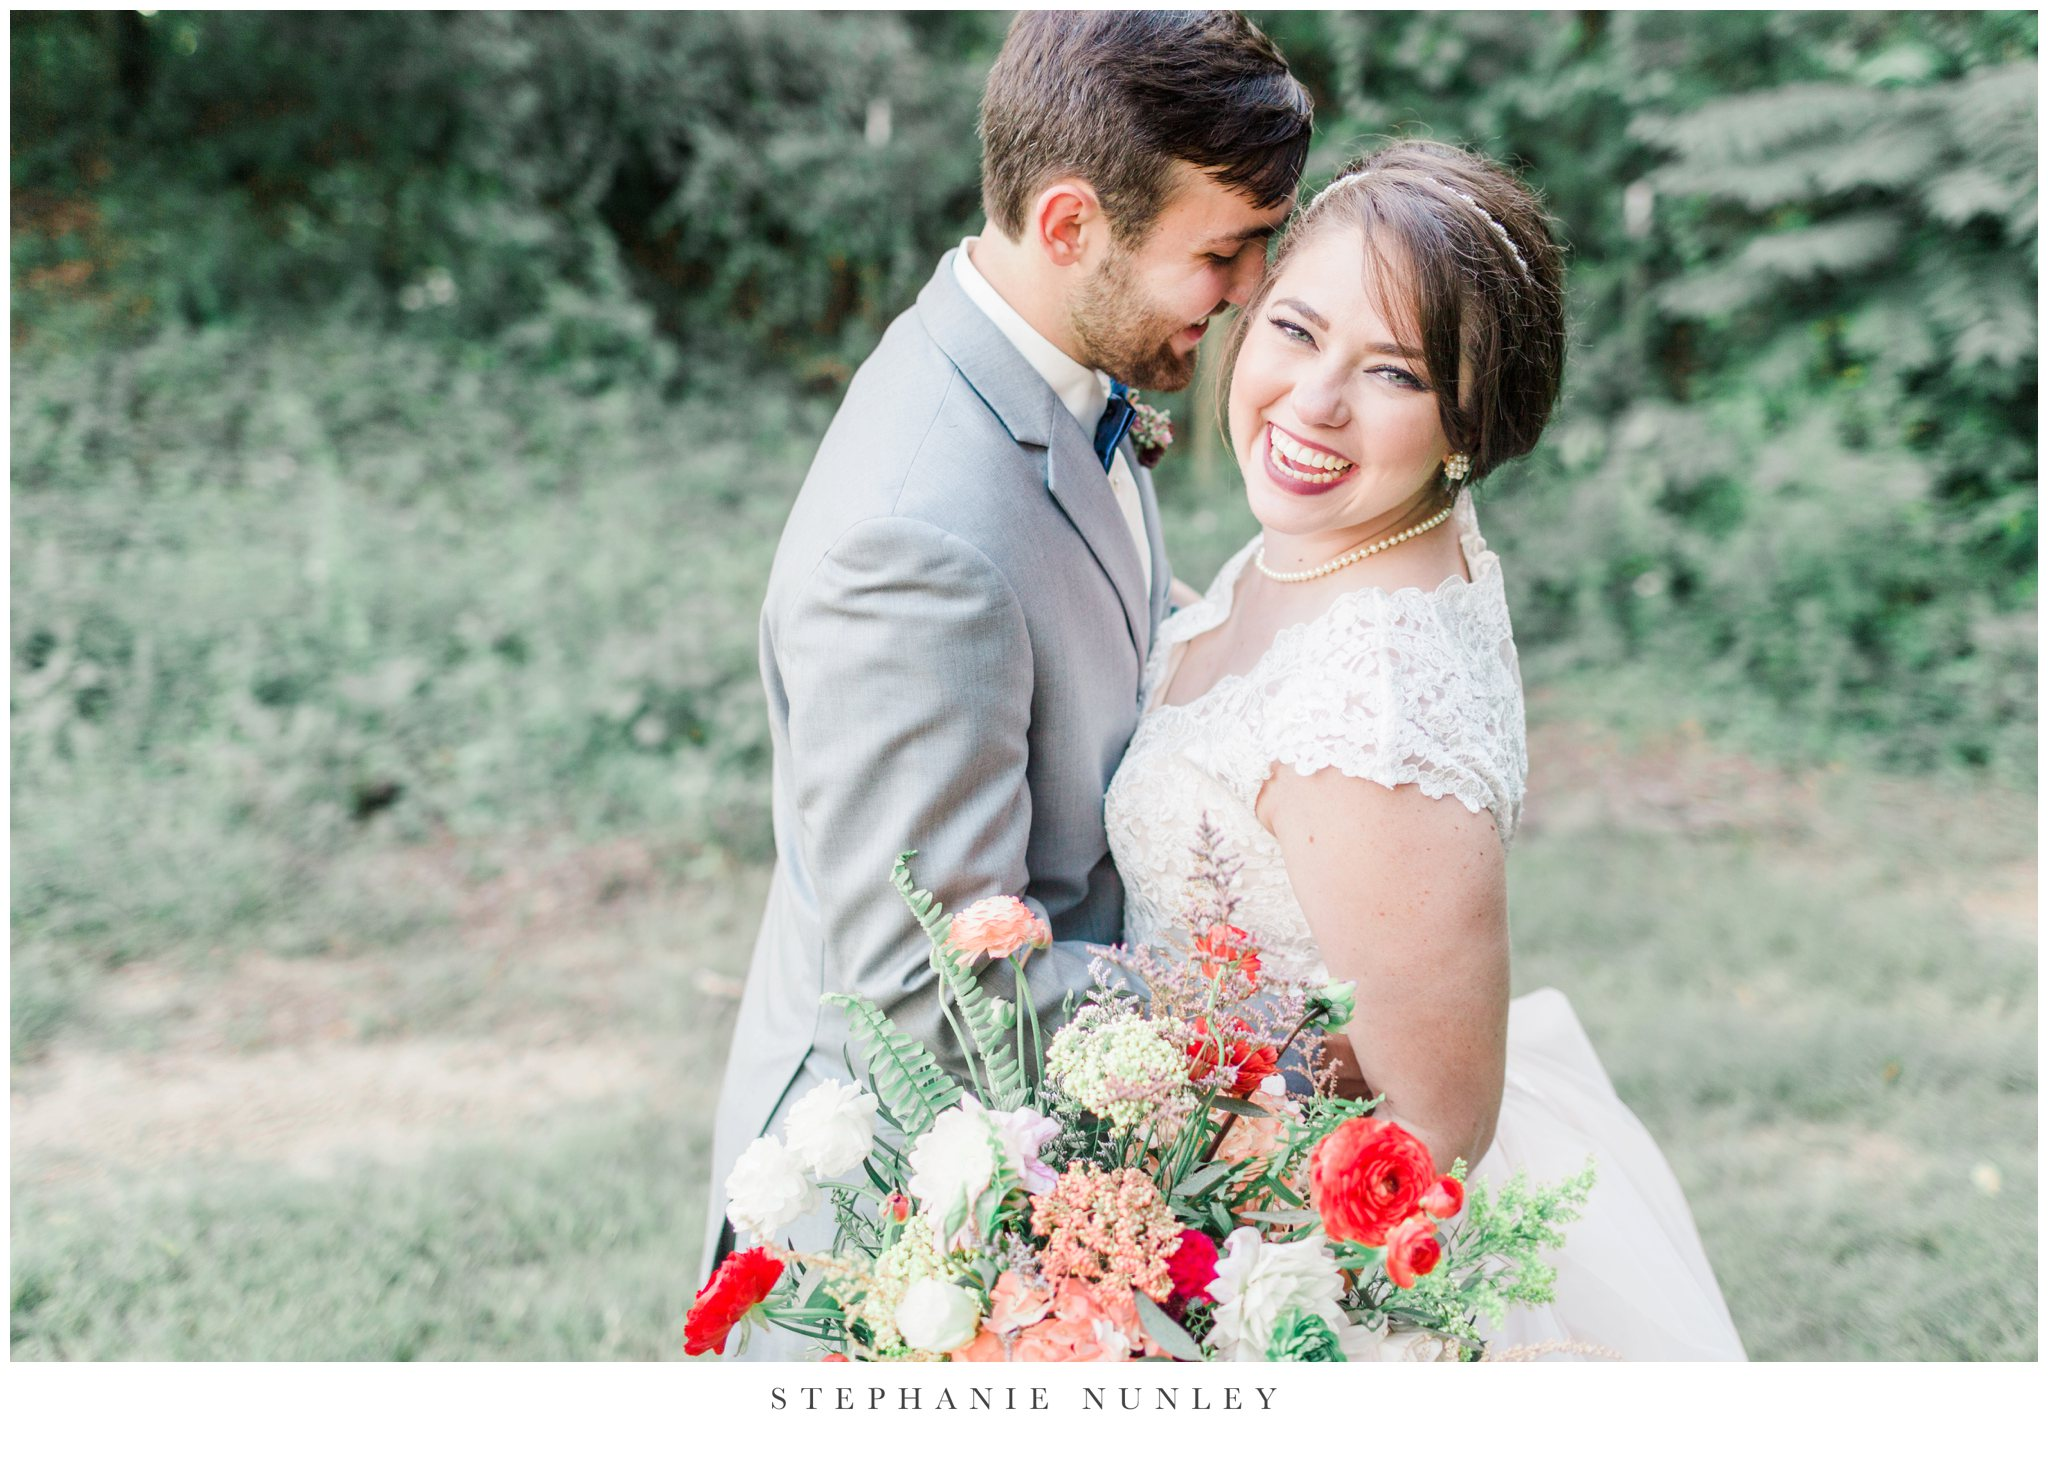 arkansas-wedding-with-lush-wildflower-bouquet-0125.jpg